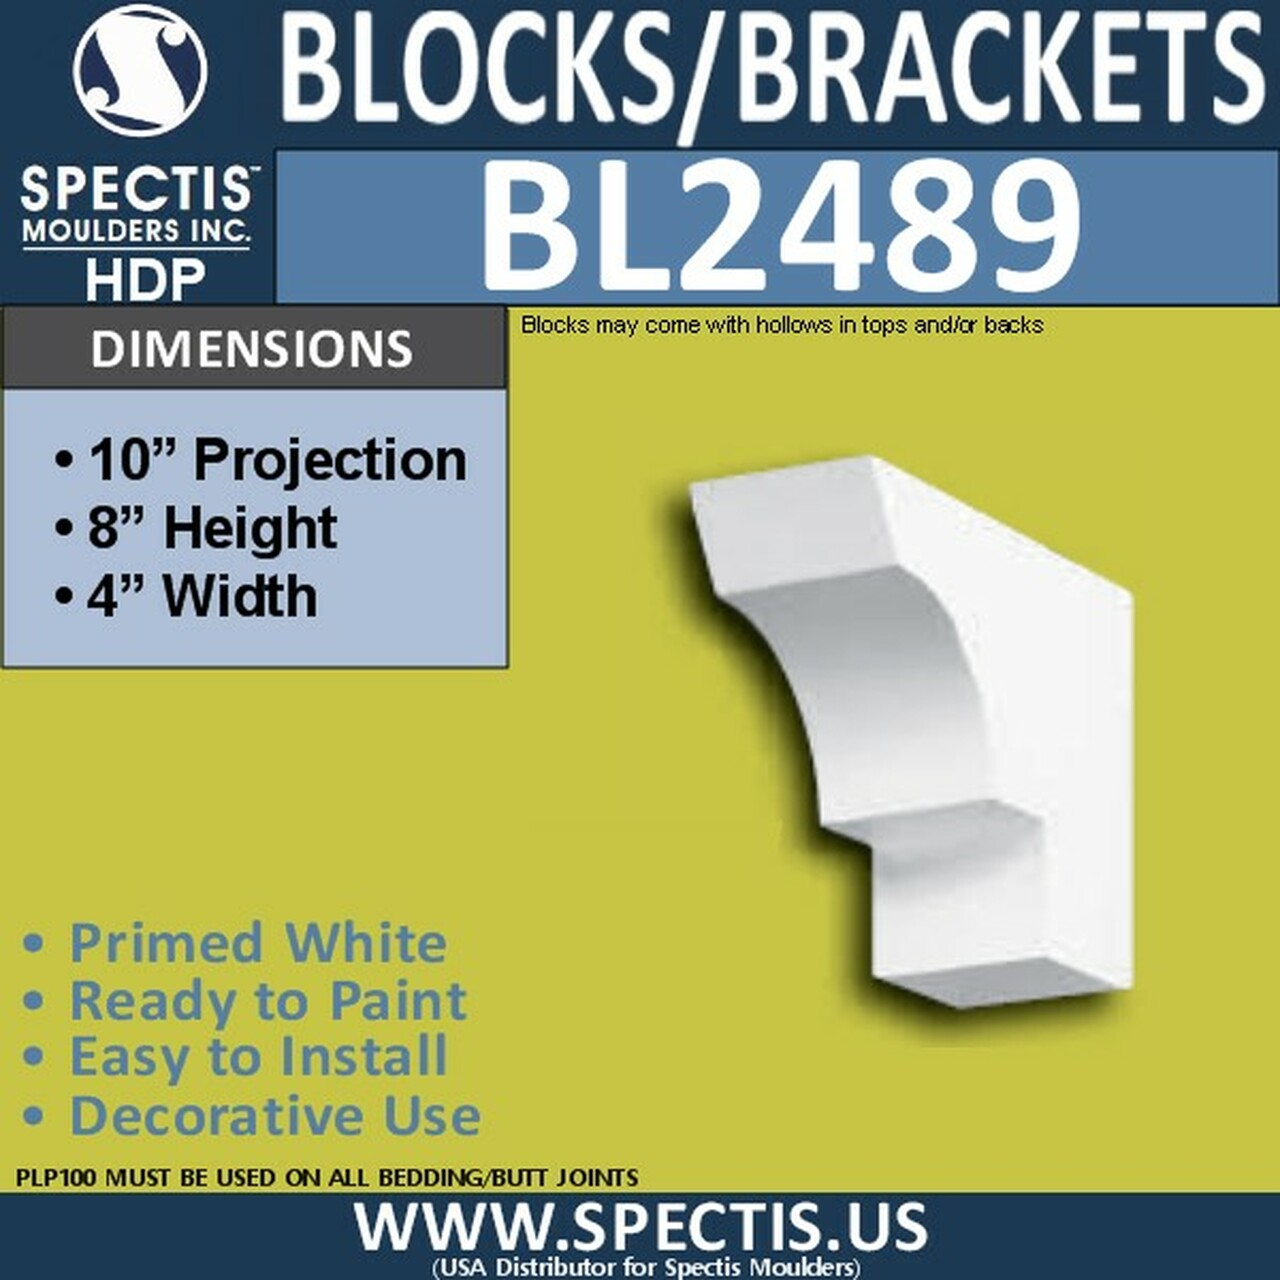 "BL2489 Eave Block or Bracket 4""W x 8""H x 10"" P"